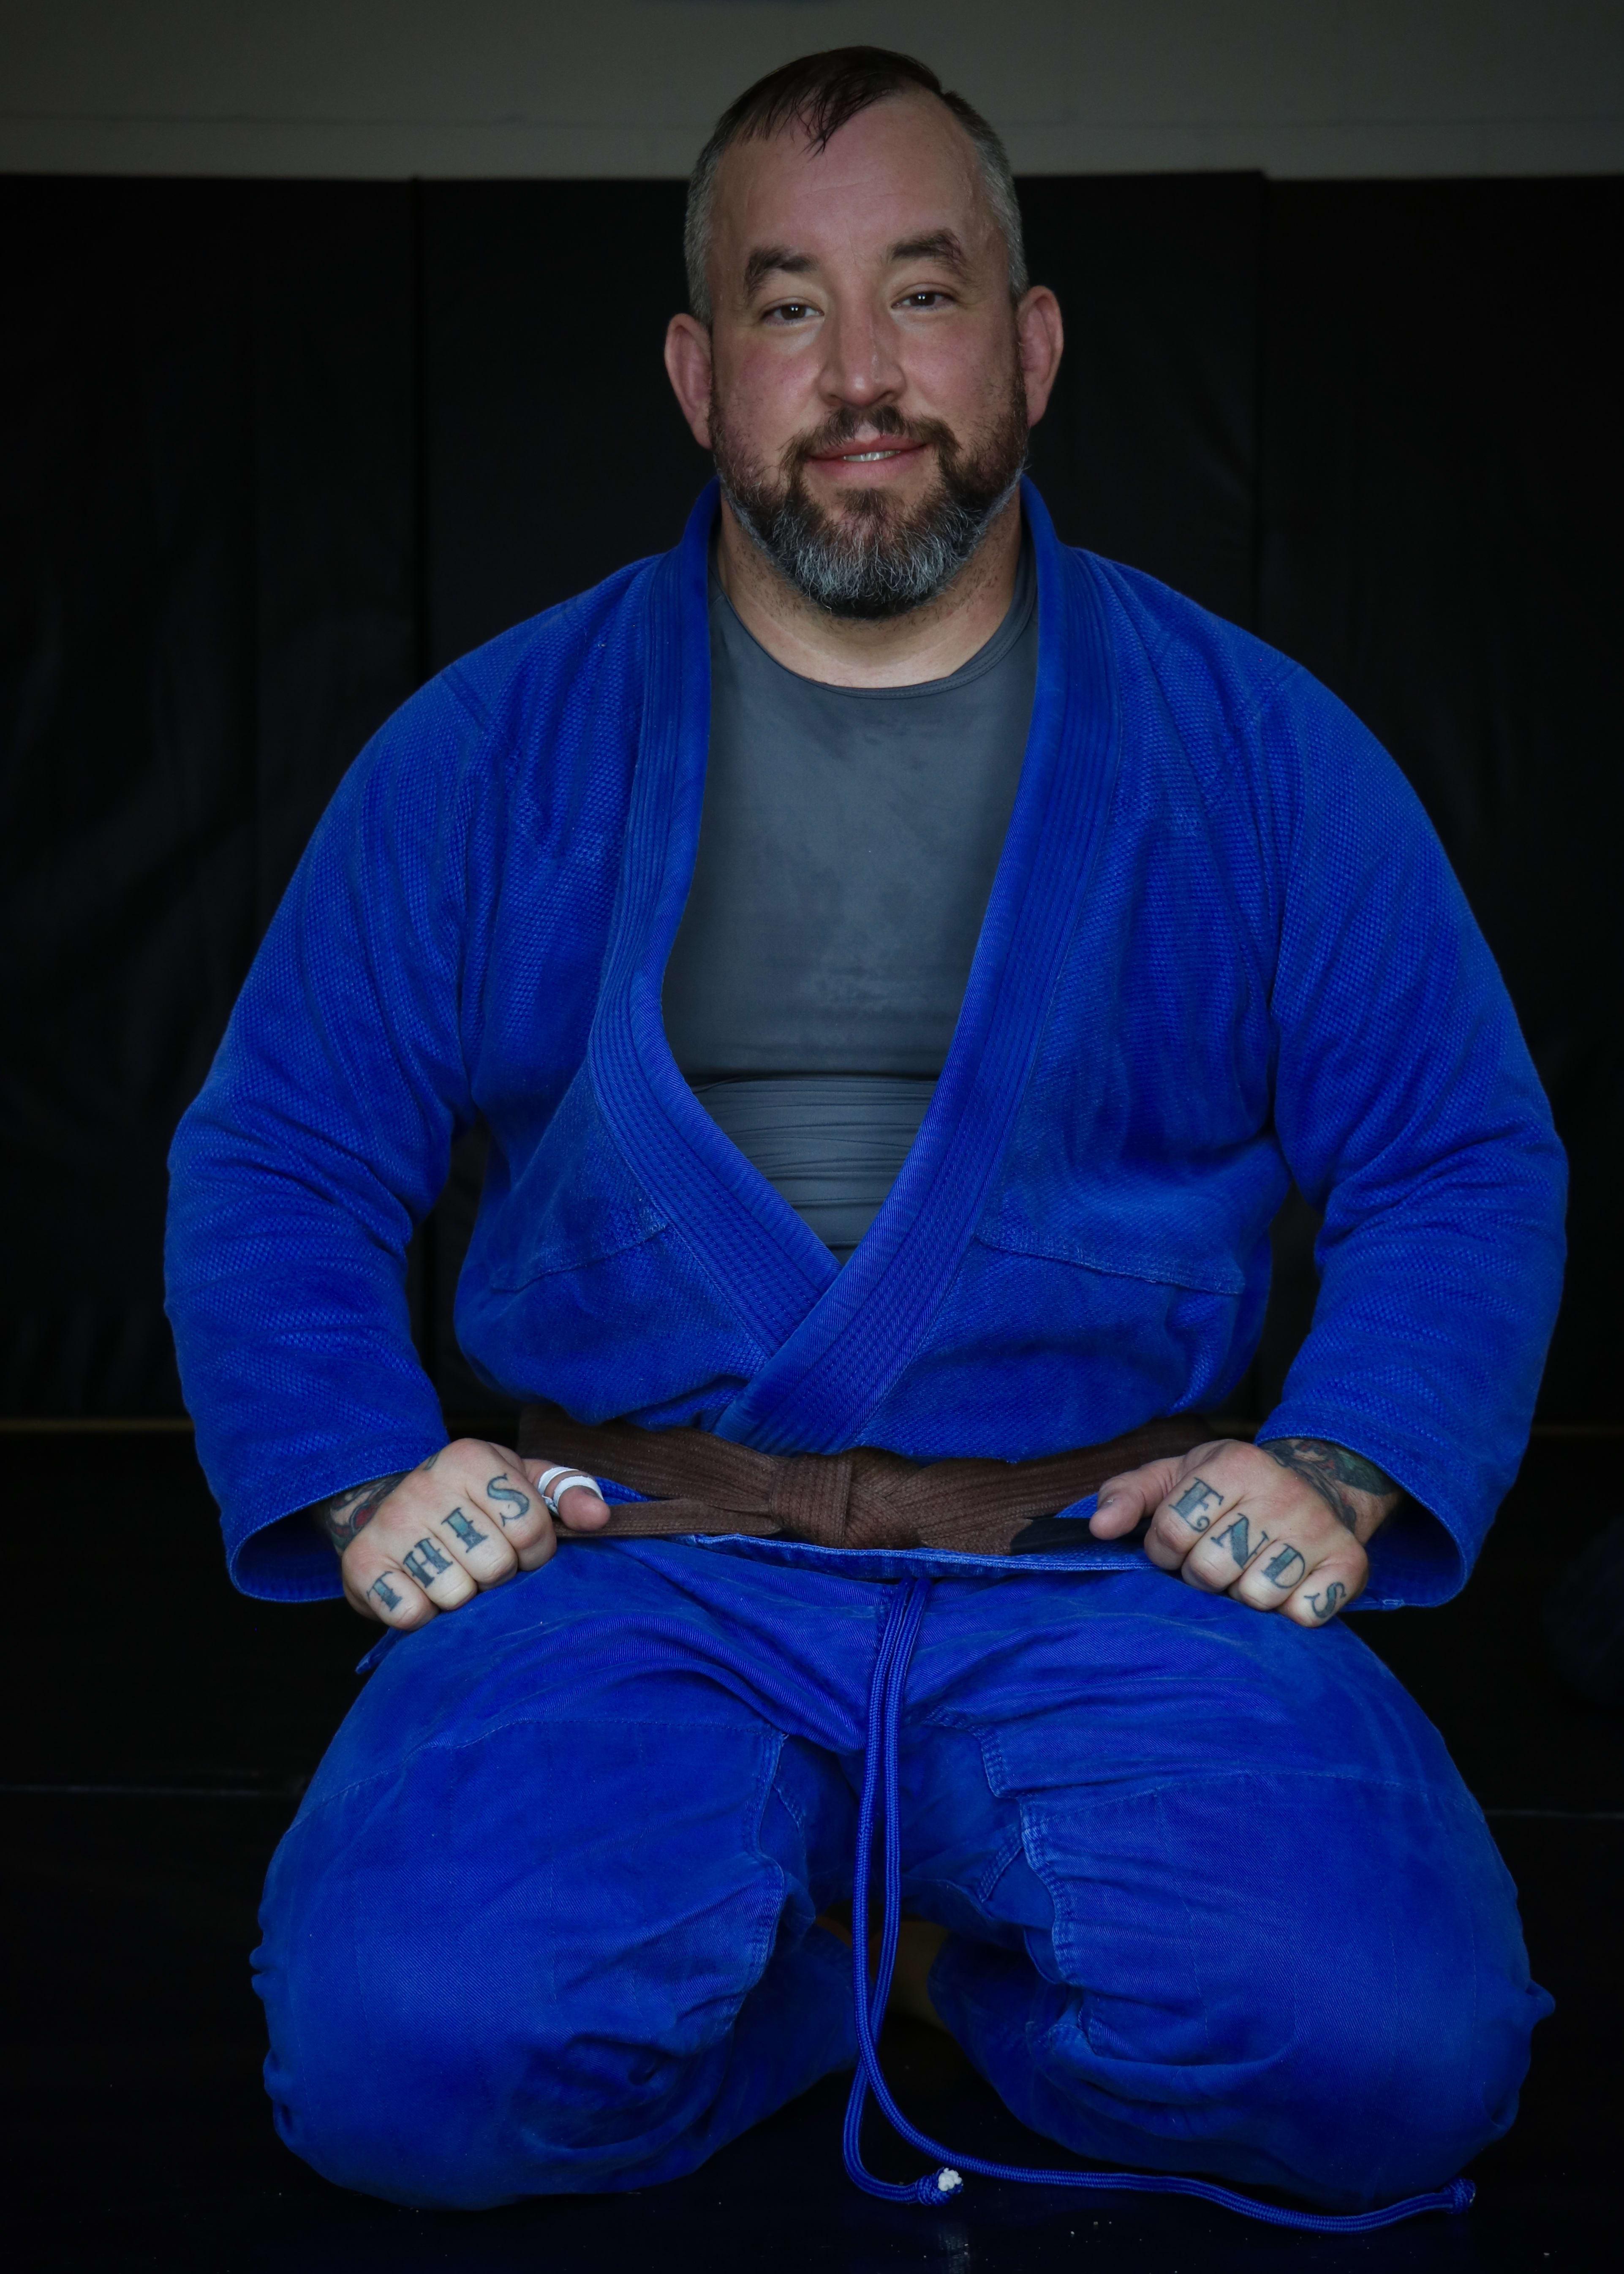 Jason Cox in Denver - Dark Horse Combat Club